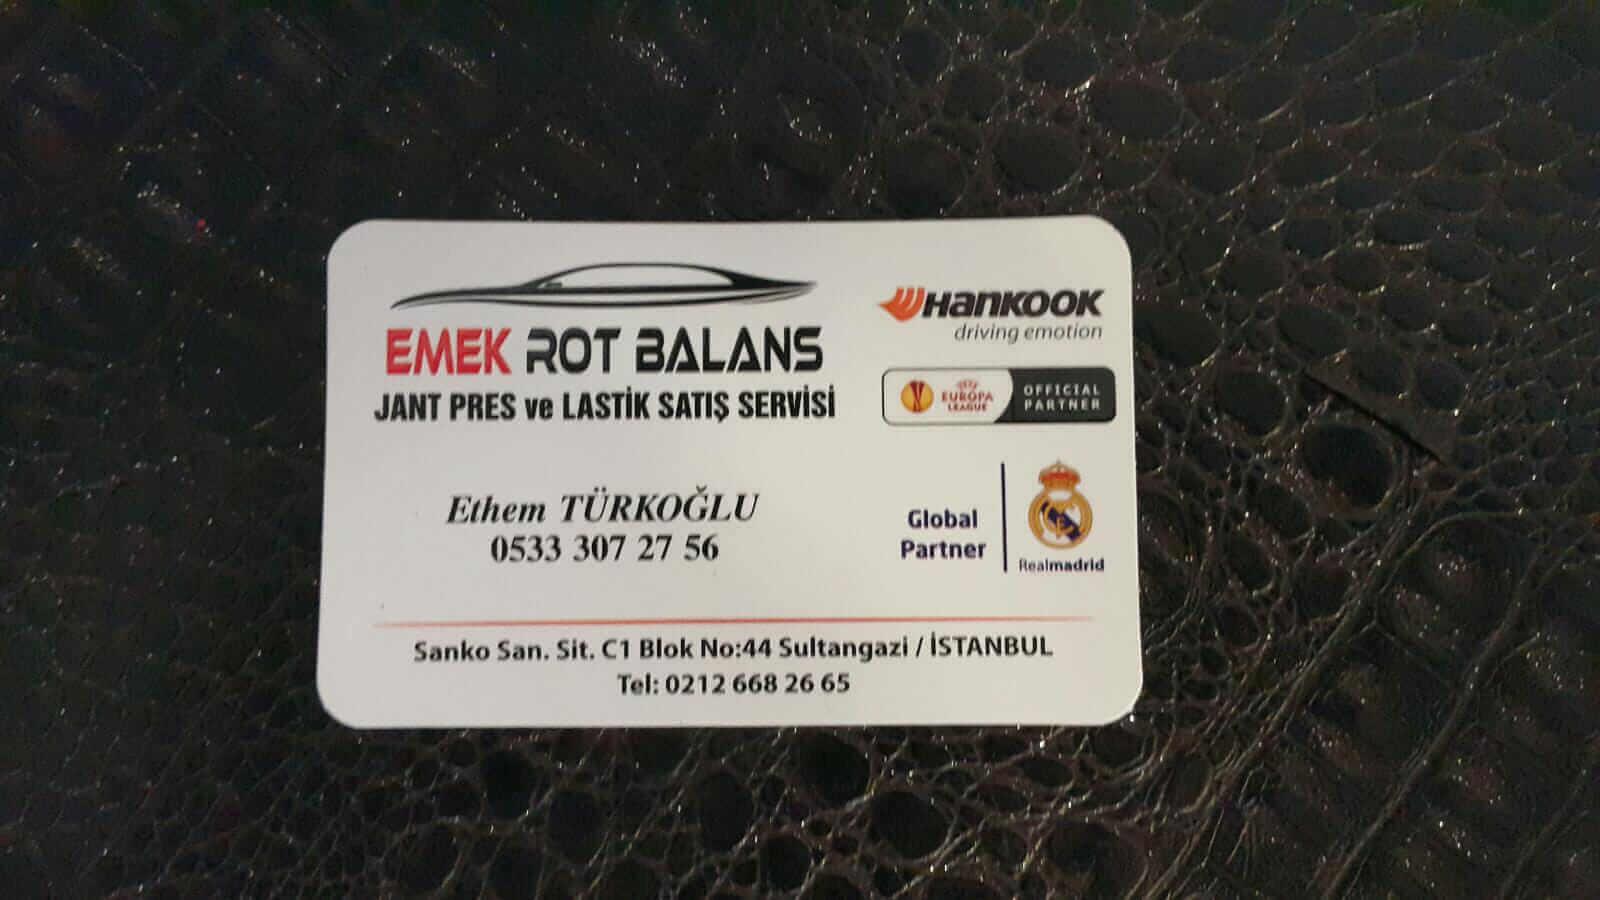 Emek Rot Balans